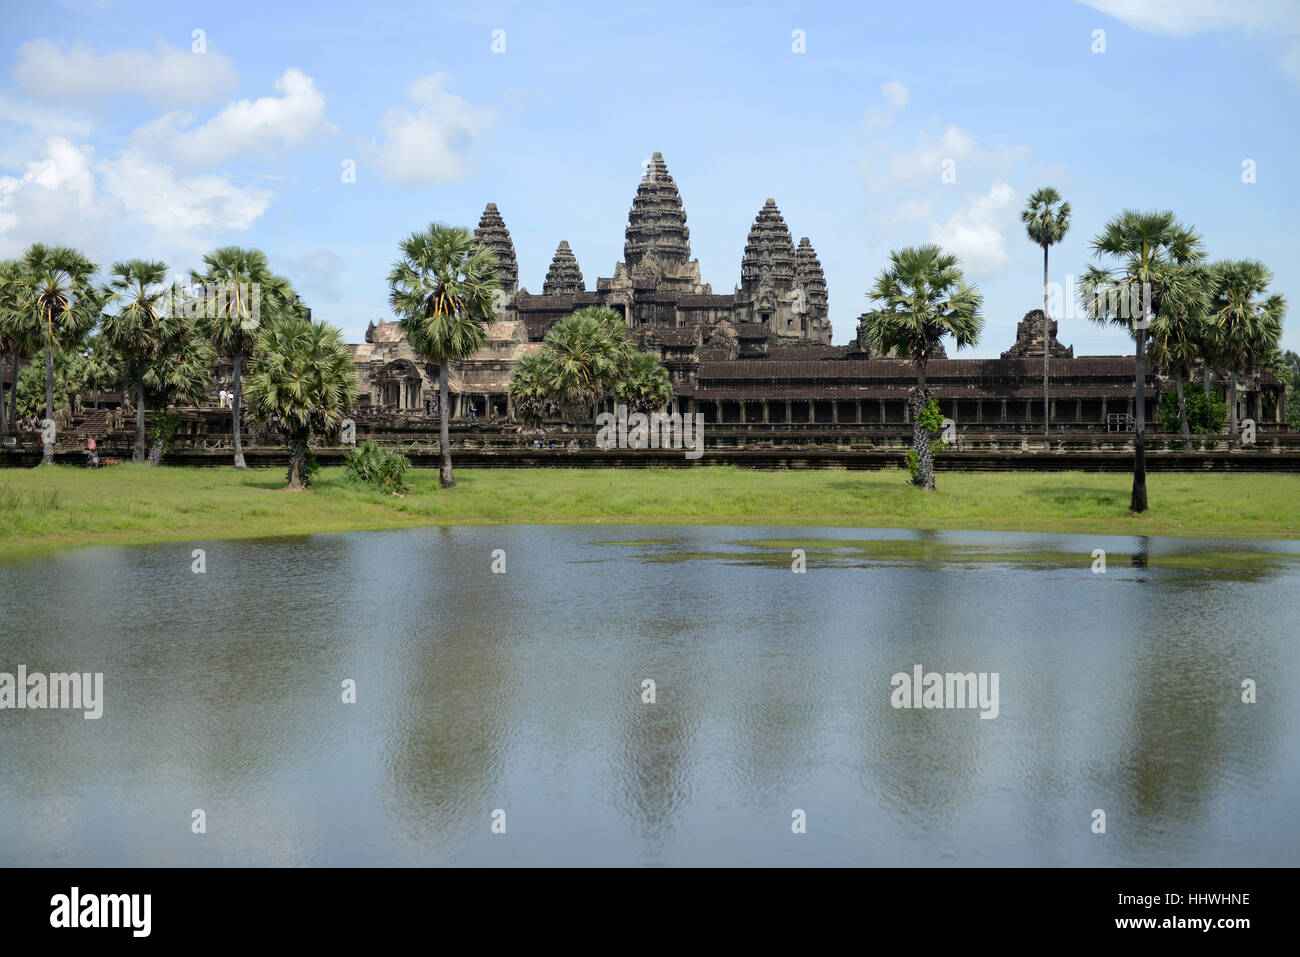 Angkor Wat, Siem Reap, Cambodia, Southeast Asia. - Stock Image